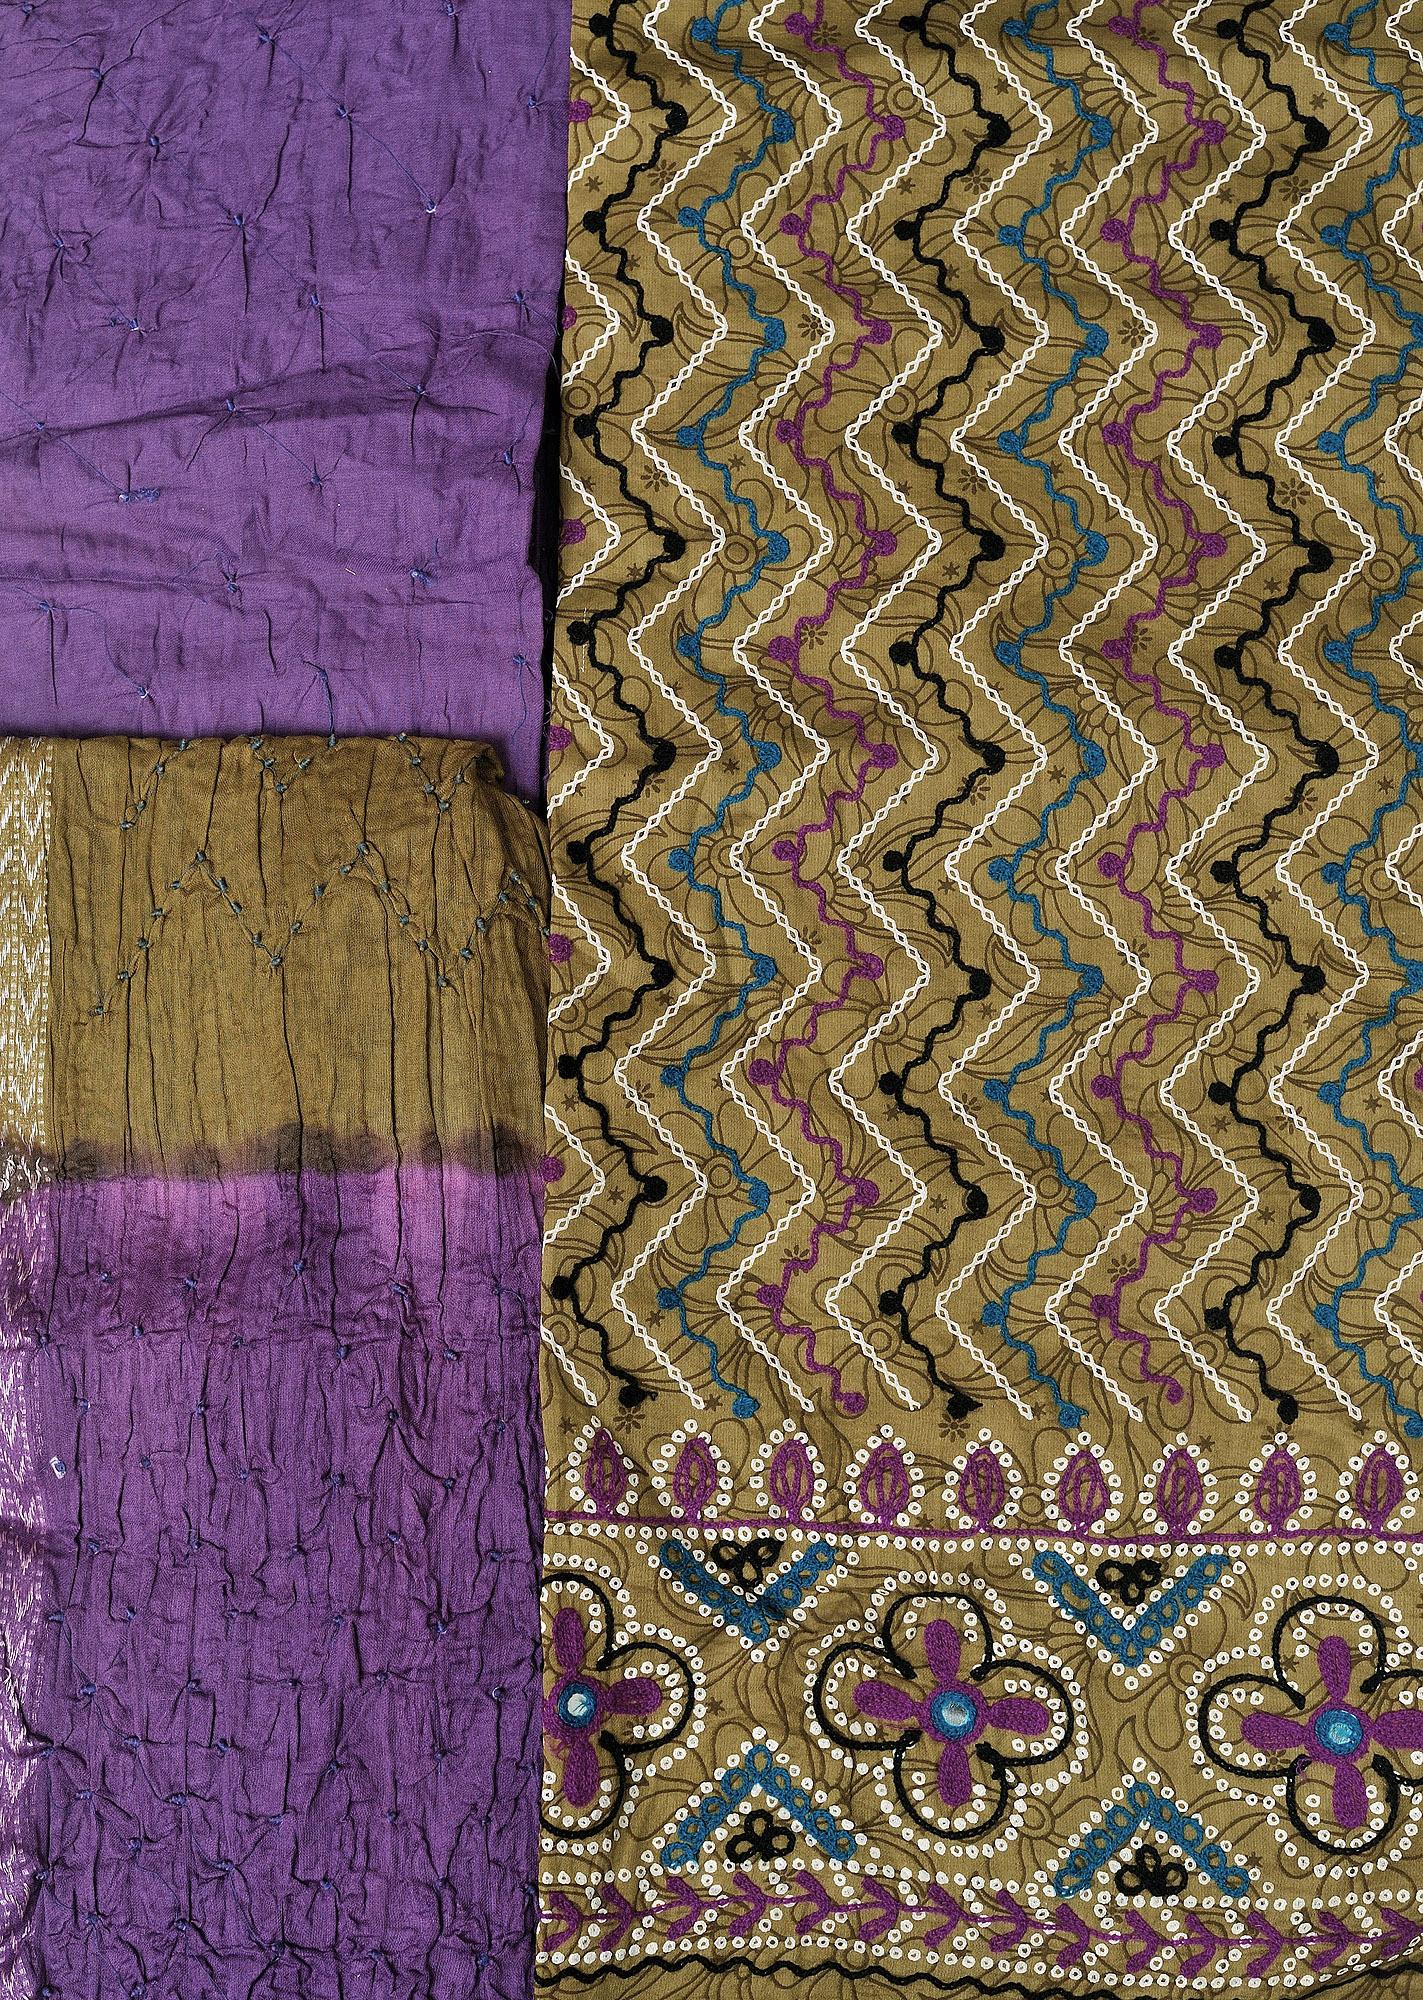 Ecru olive and purple salwar kameez fabric from gujarat